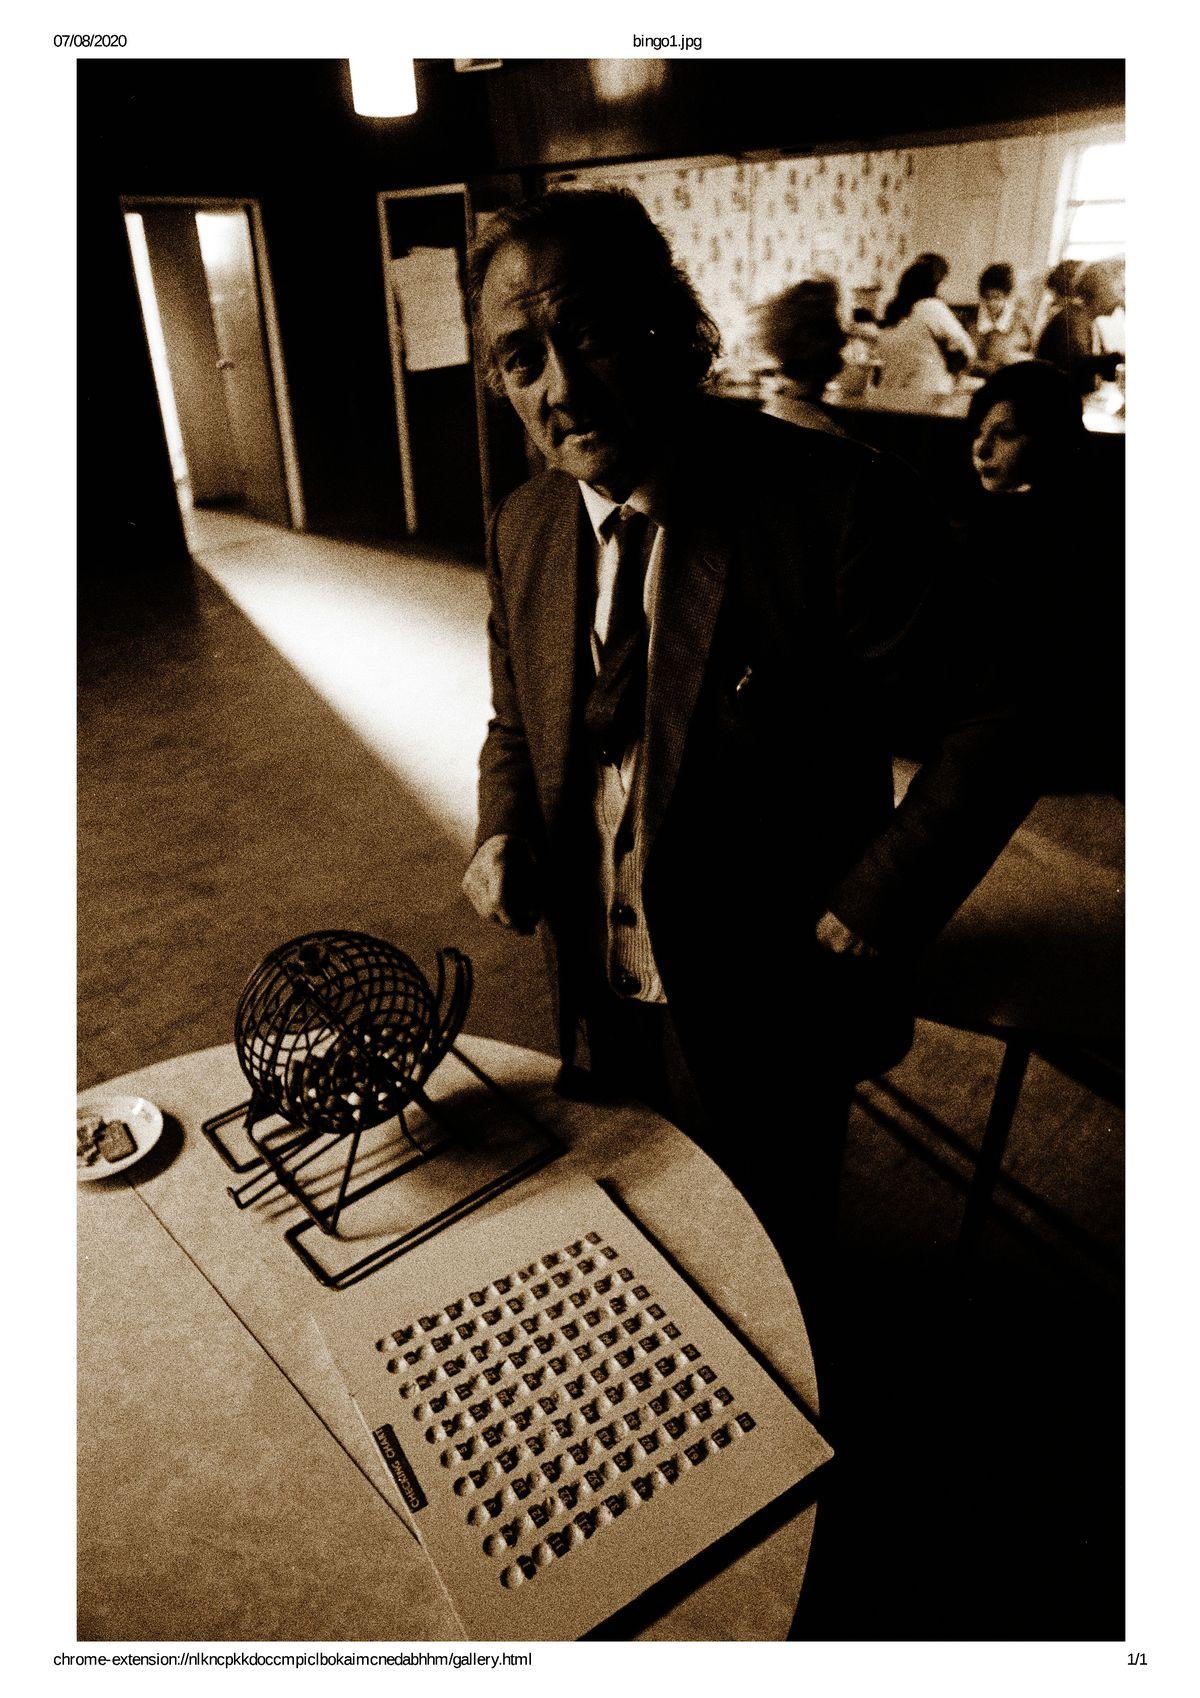 A bingo session at The Scotlands community hall